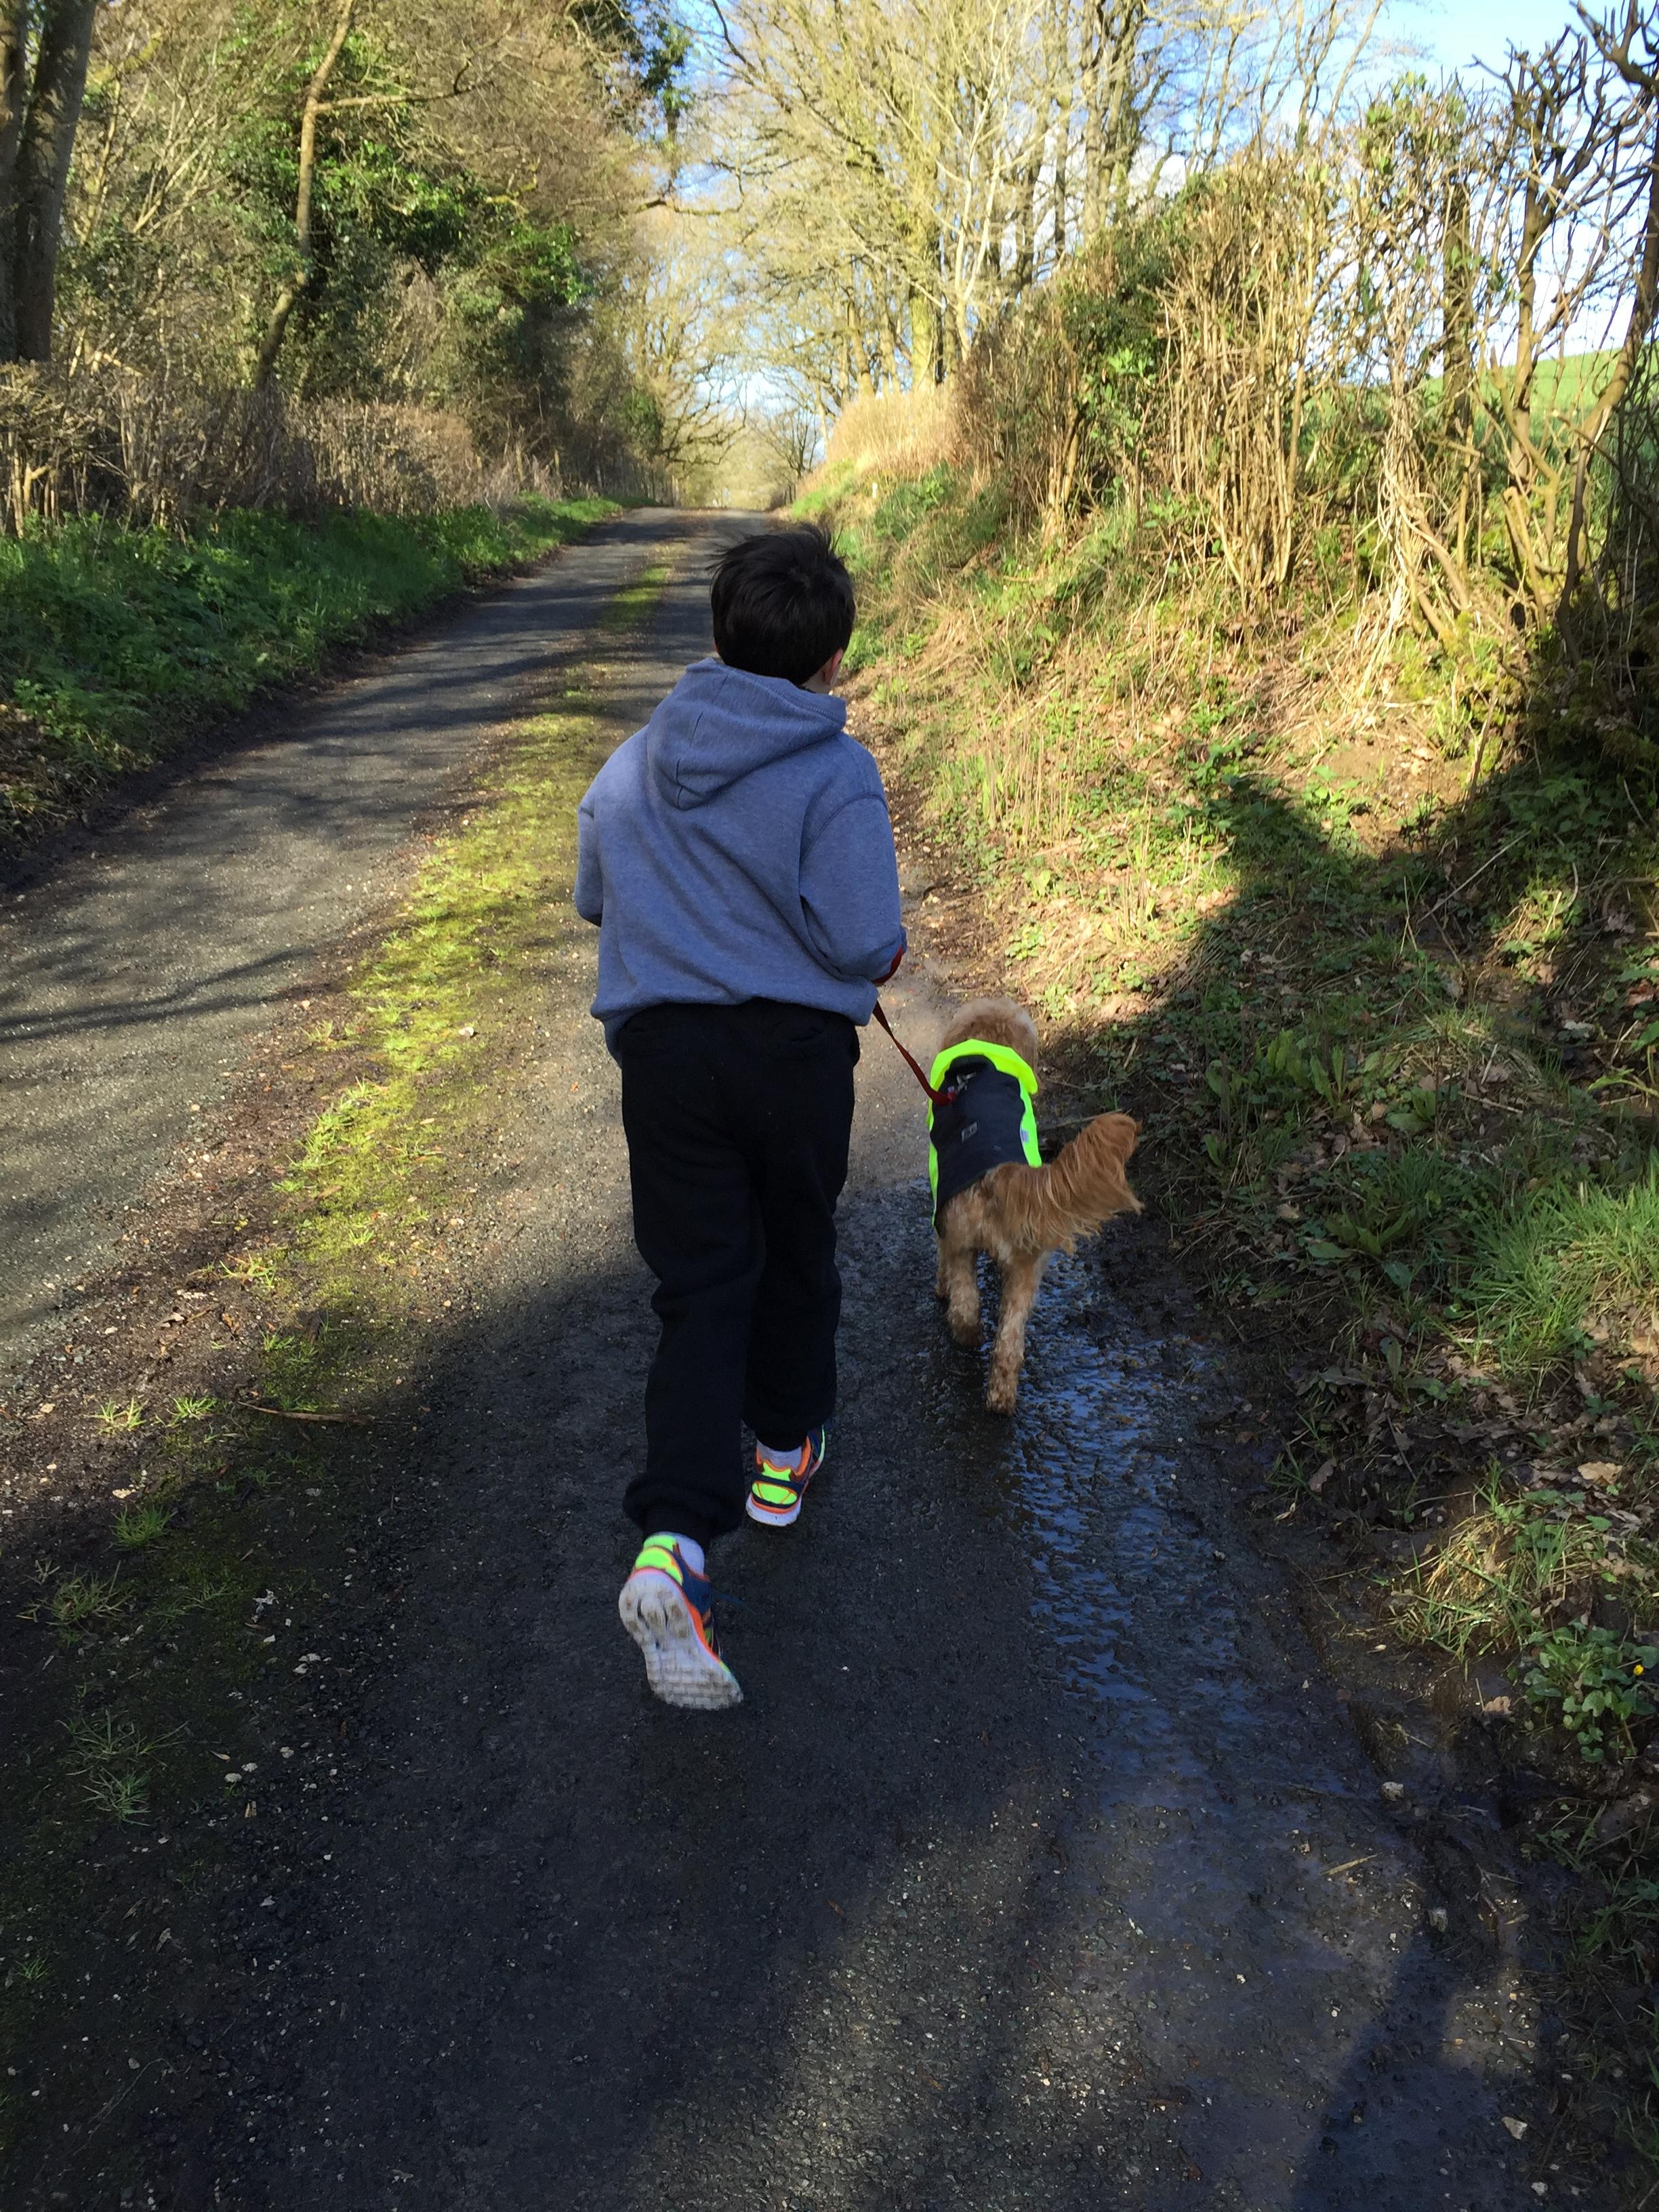 Boy running uphill with dog